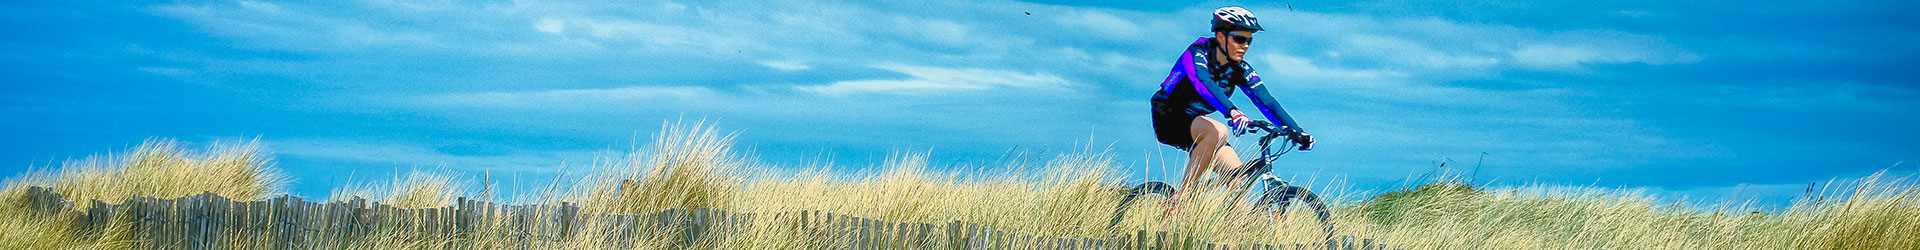 male bike rider cycling grass, blue sky background